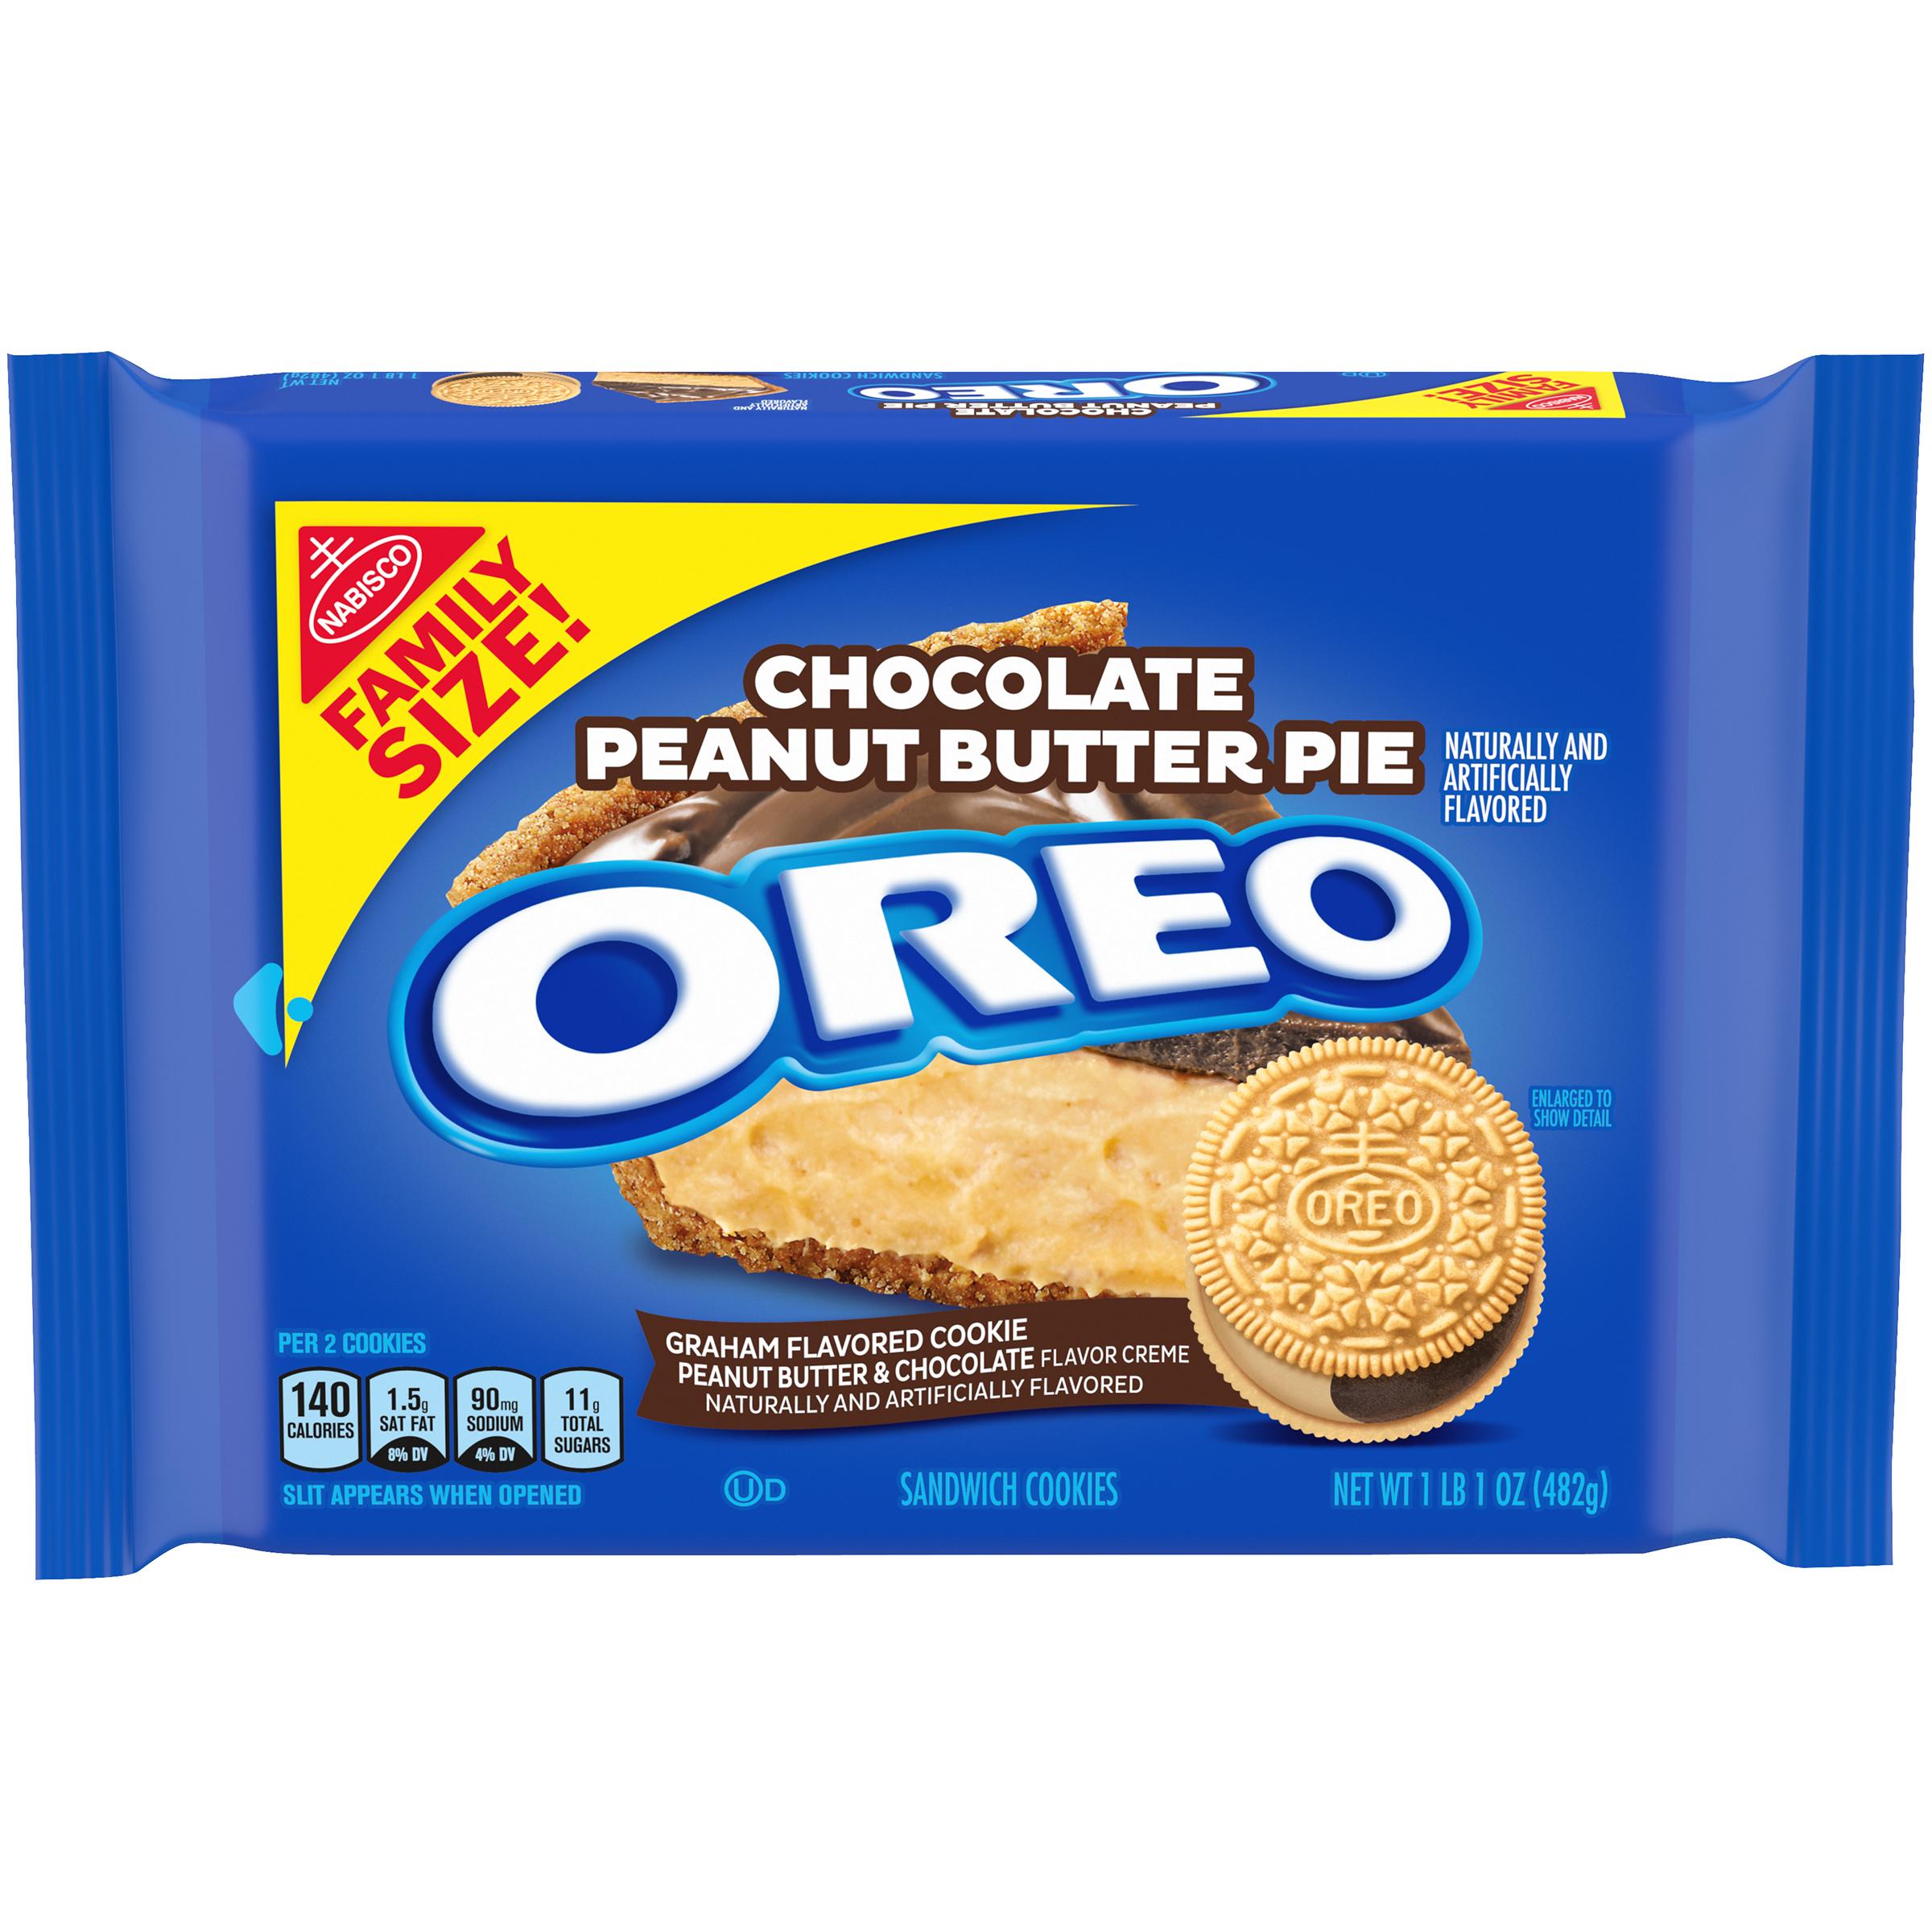 OREO Chocolate Peanut Butter Pie Sandwich Cookies 17 oz